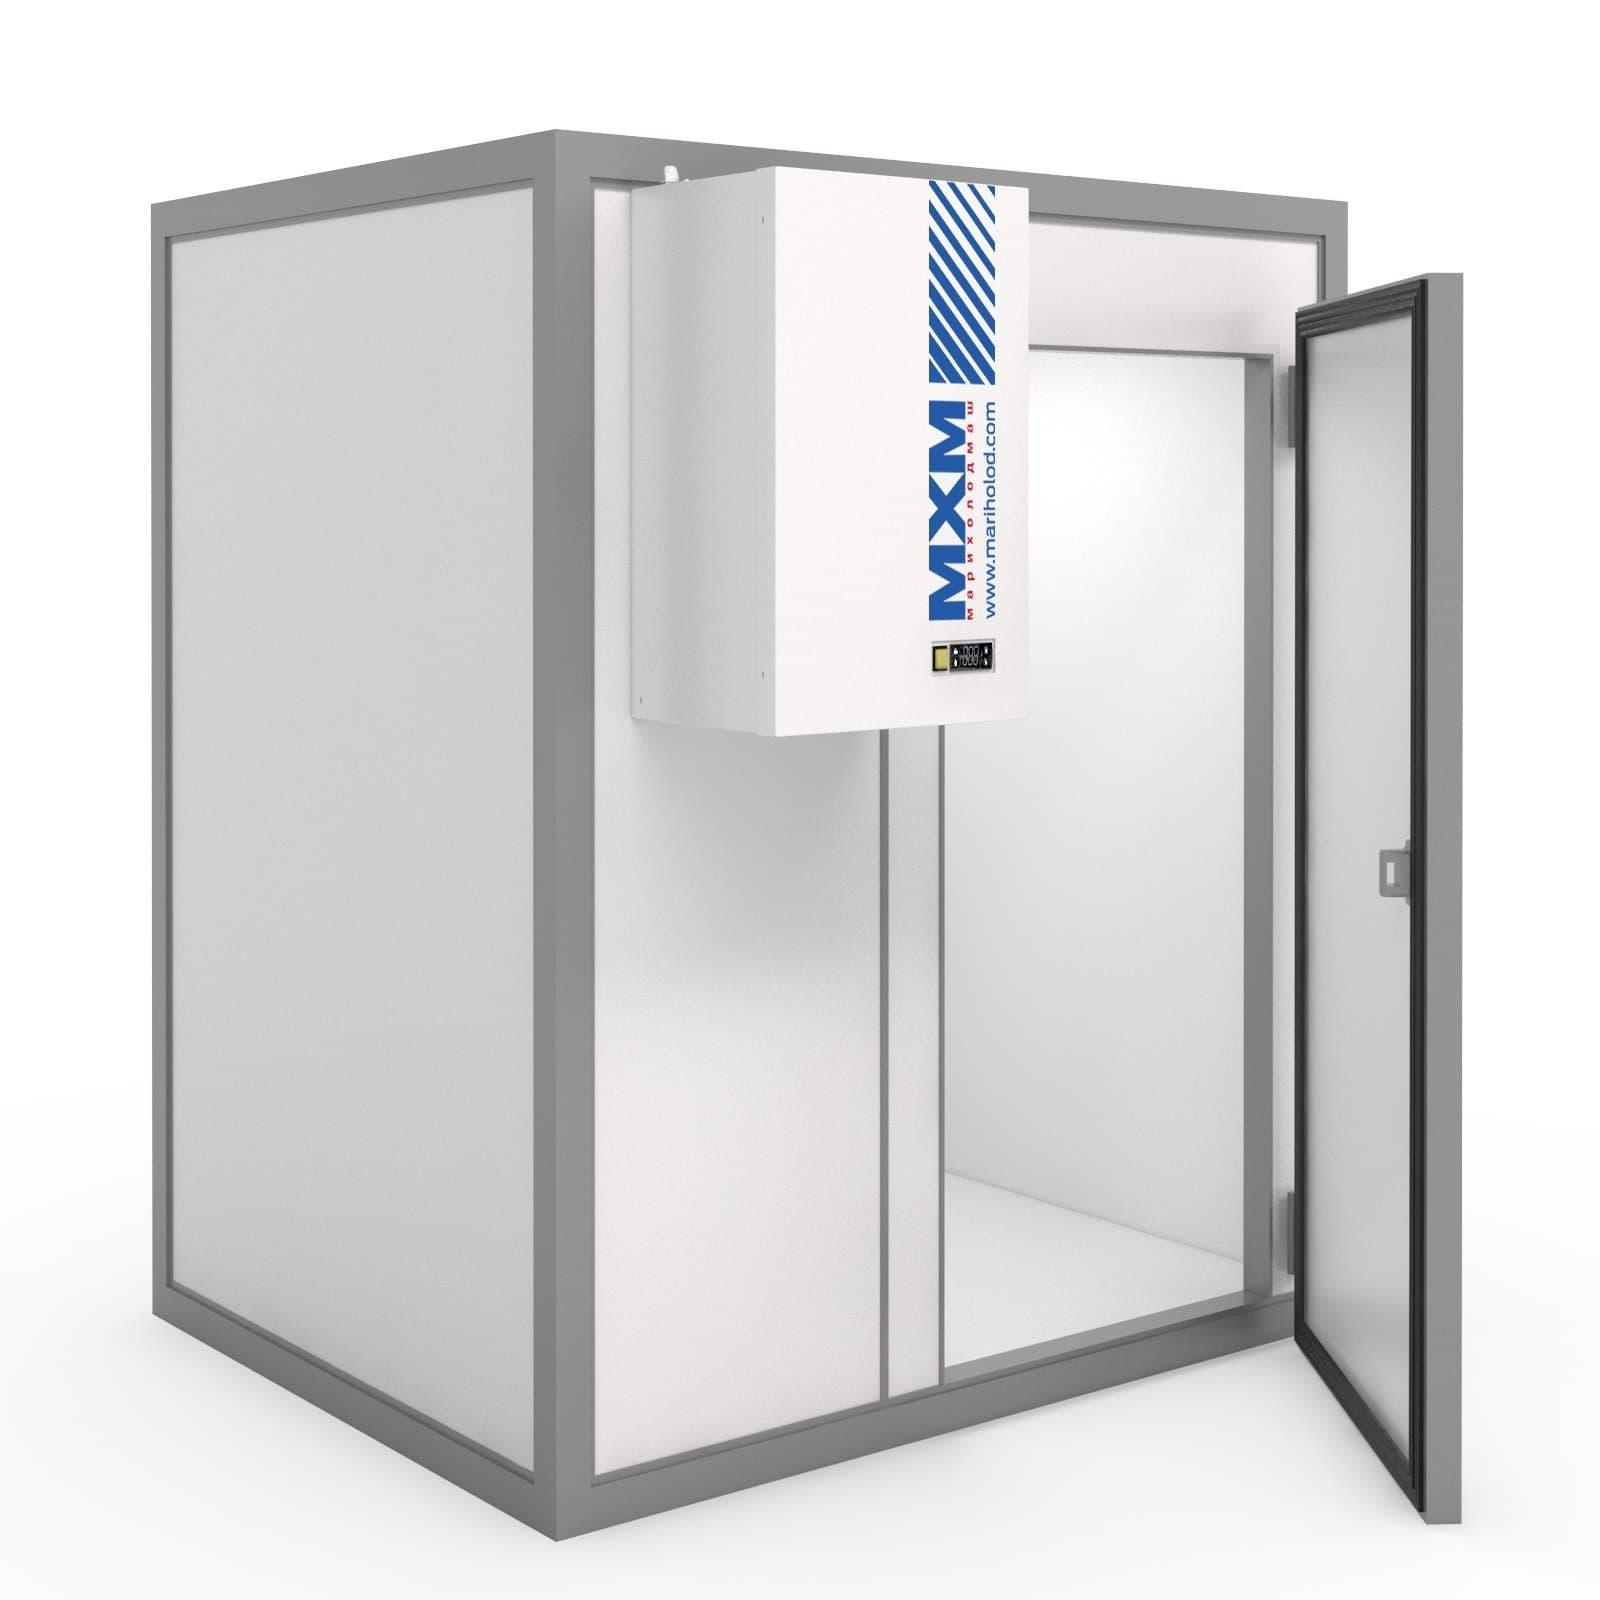 Камера холодильная МХМ КХН-37,27 2260×8860×2200